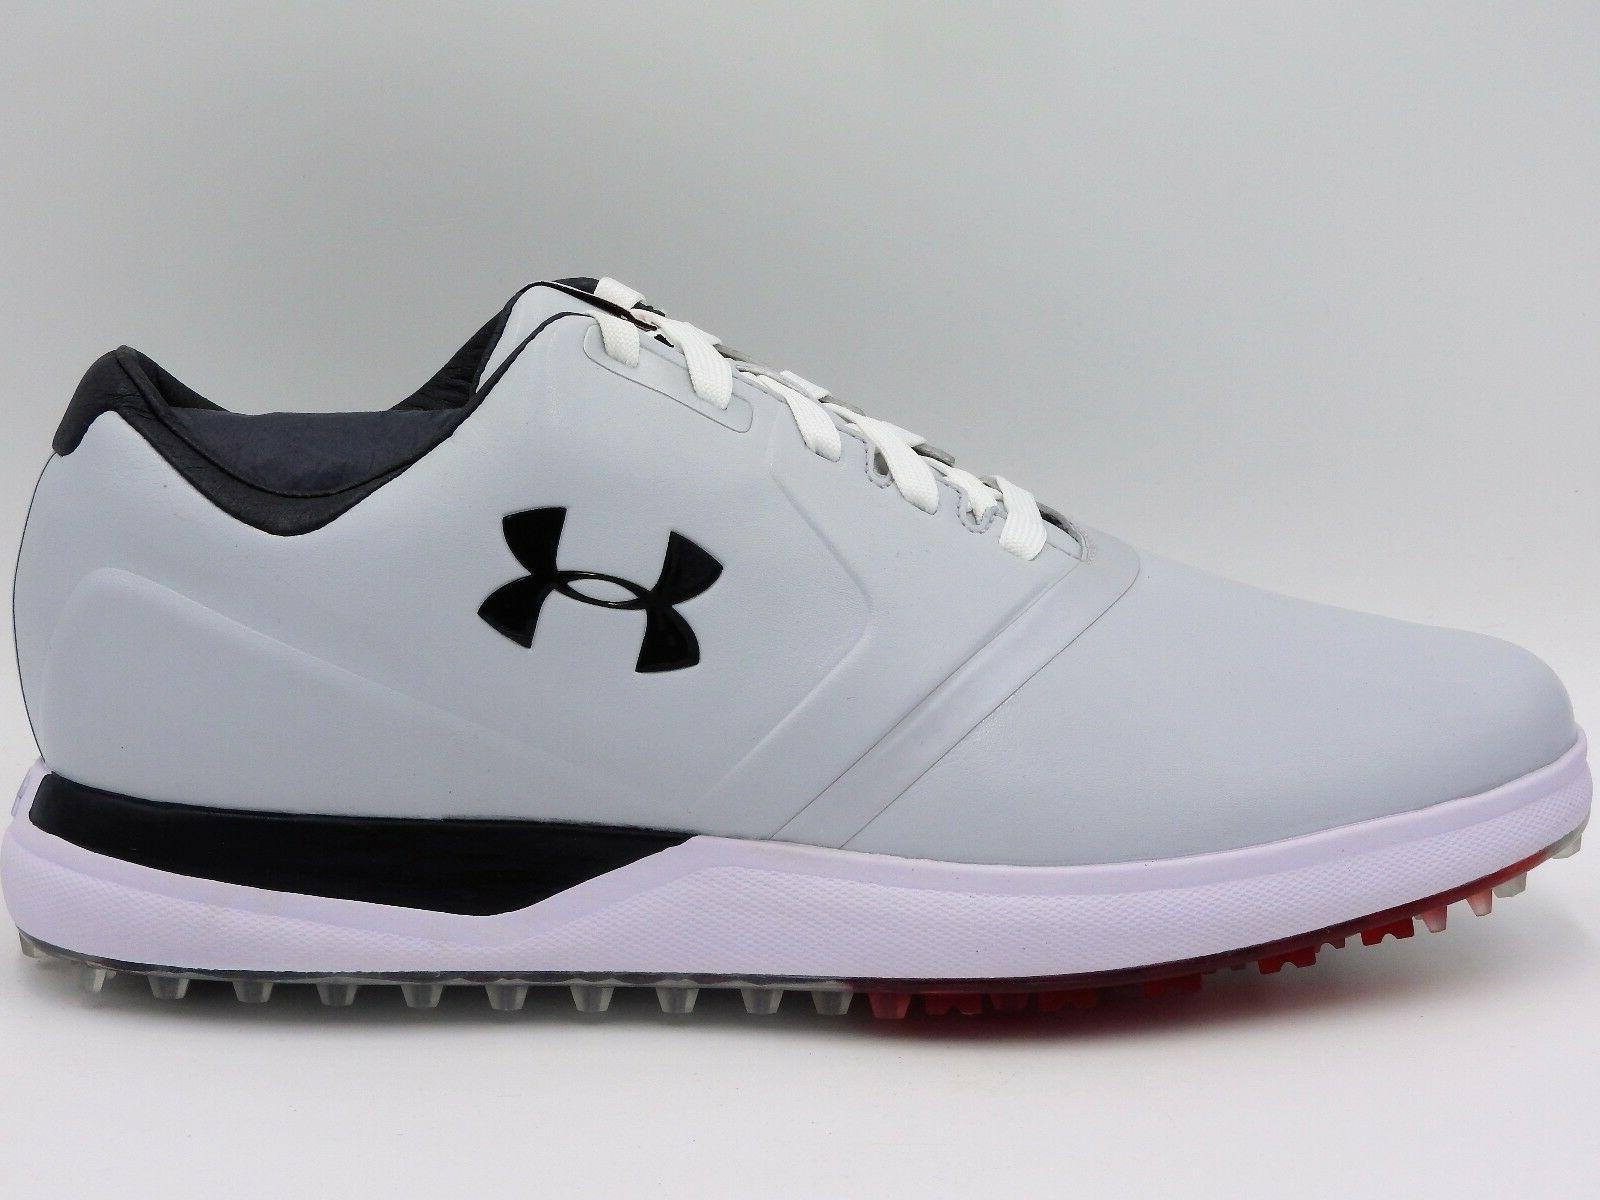 UA Under Armour Performance SL Golf Shoes,1297177-101,White,